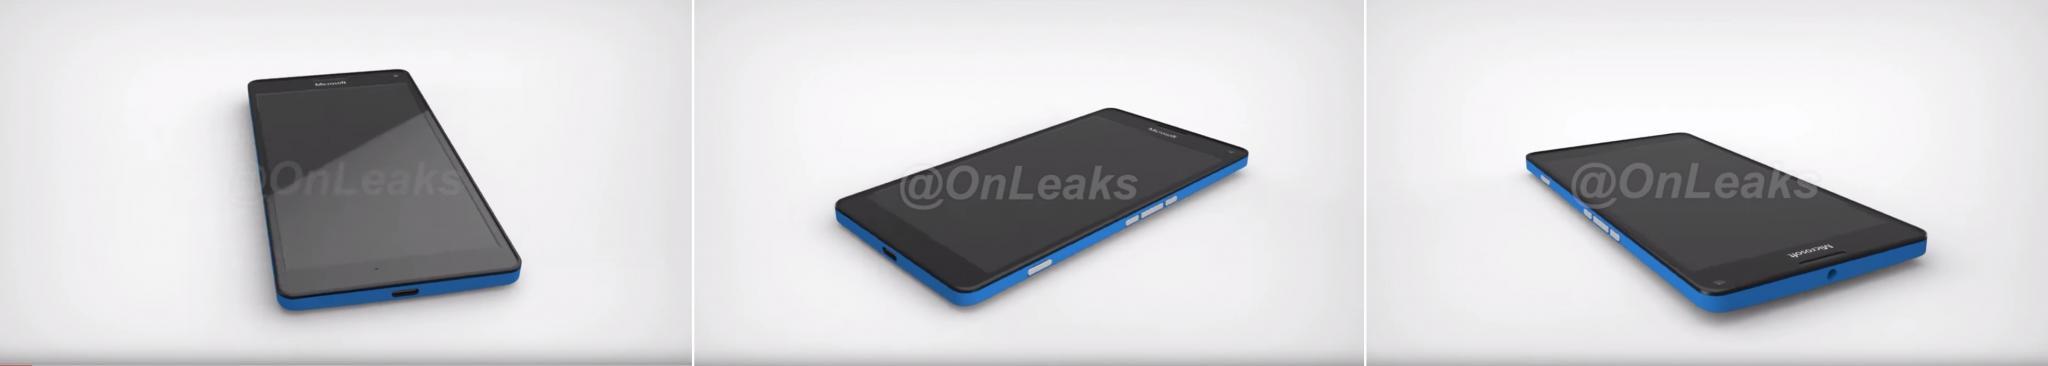 lumia-950xl-render-360-1